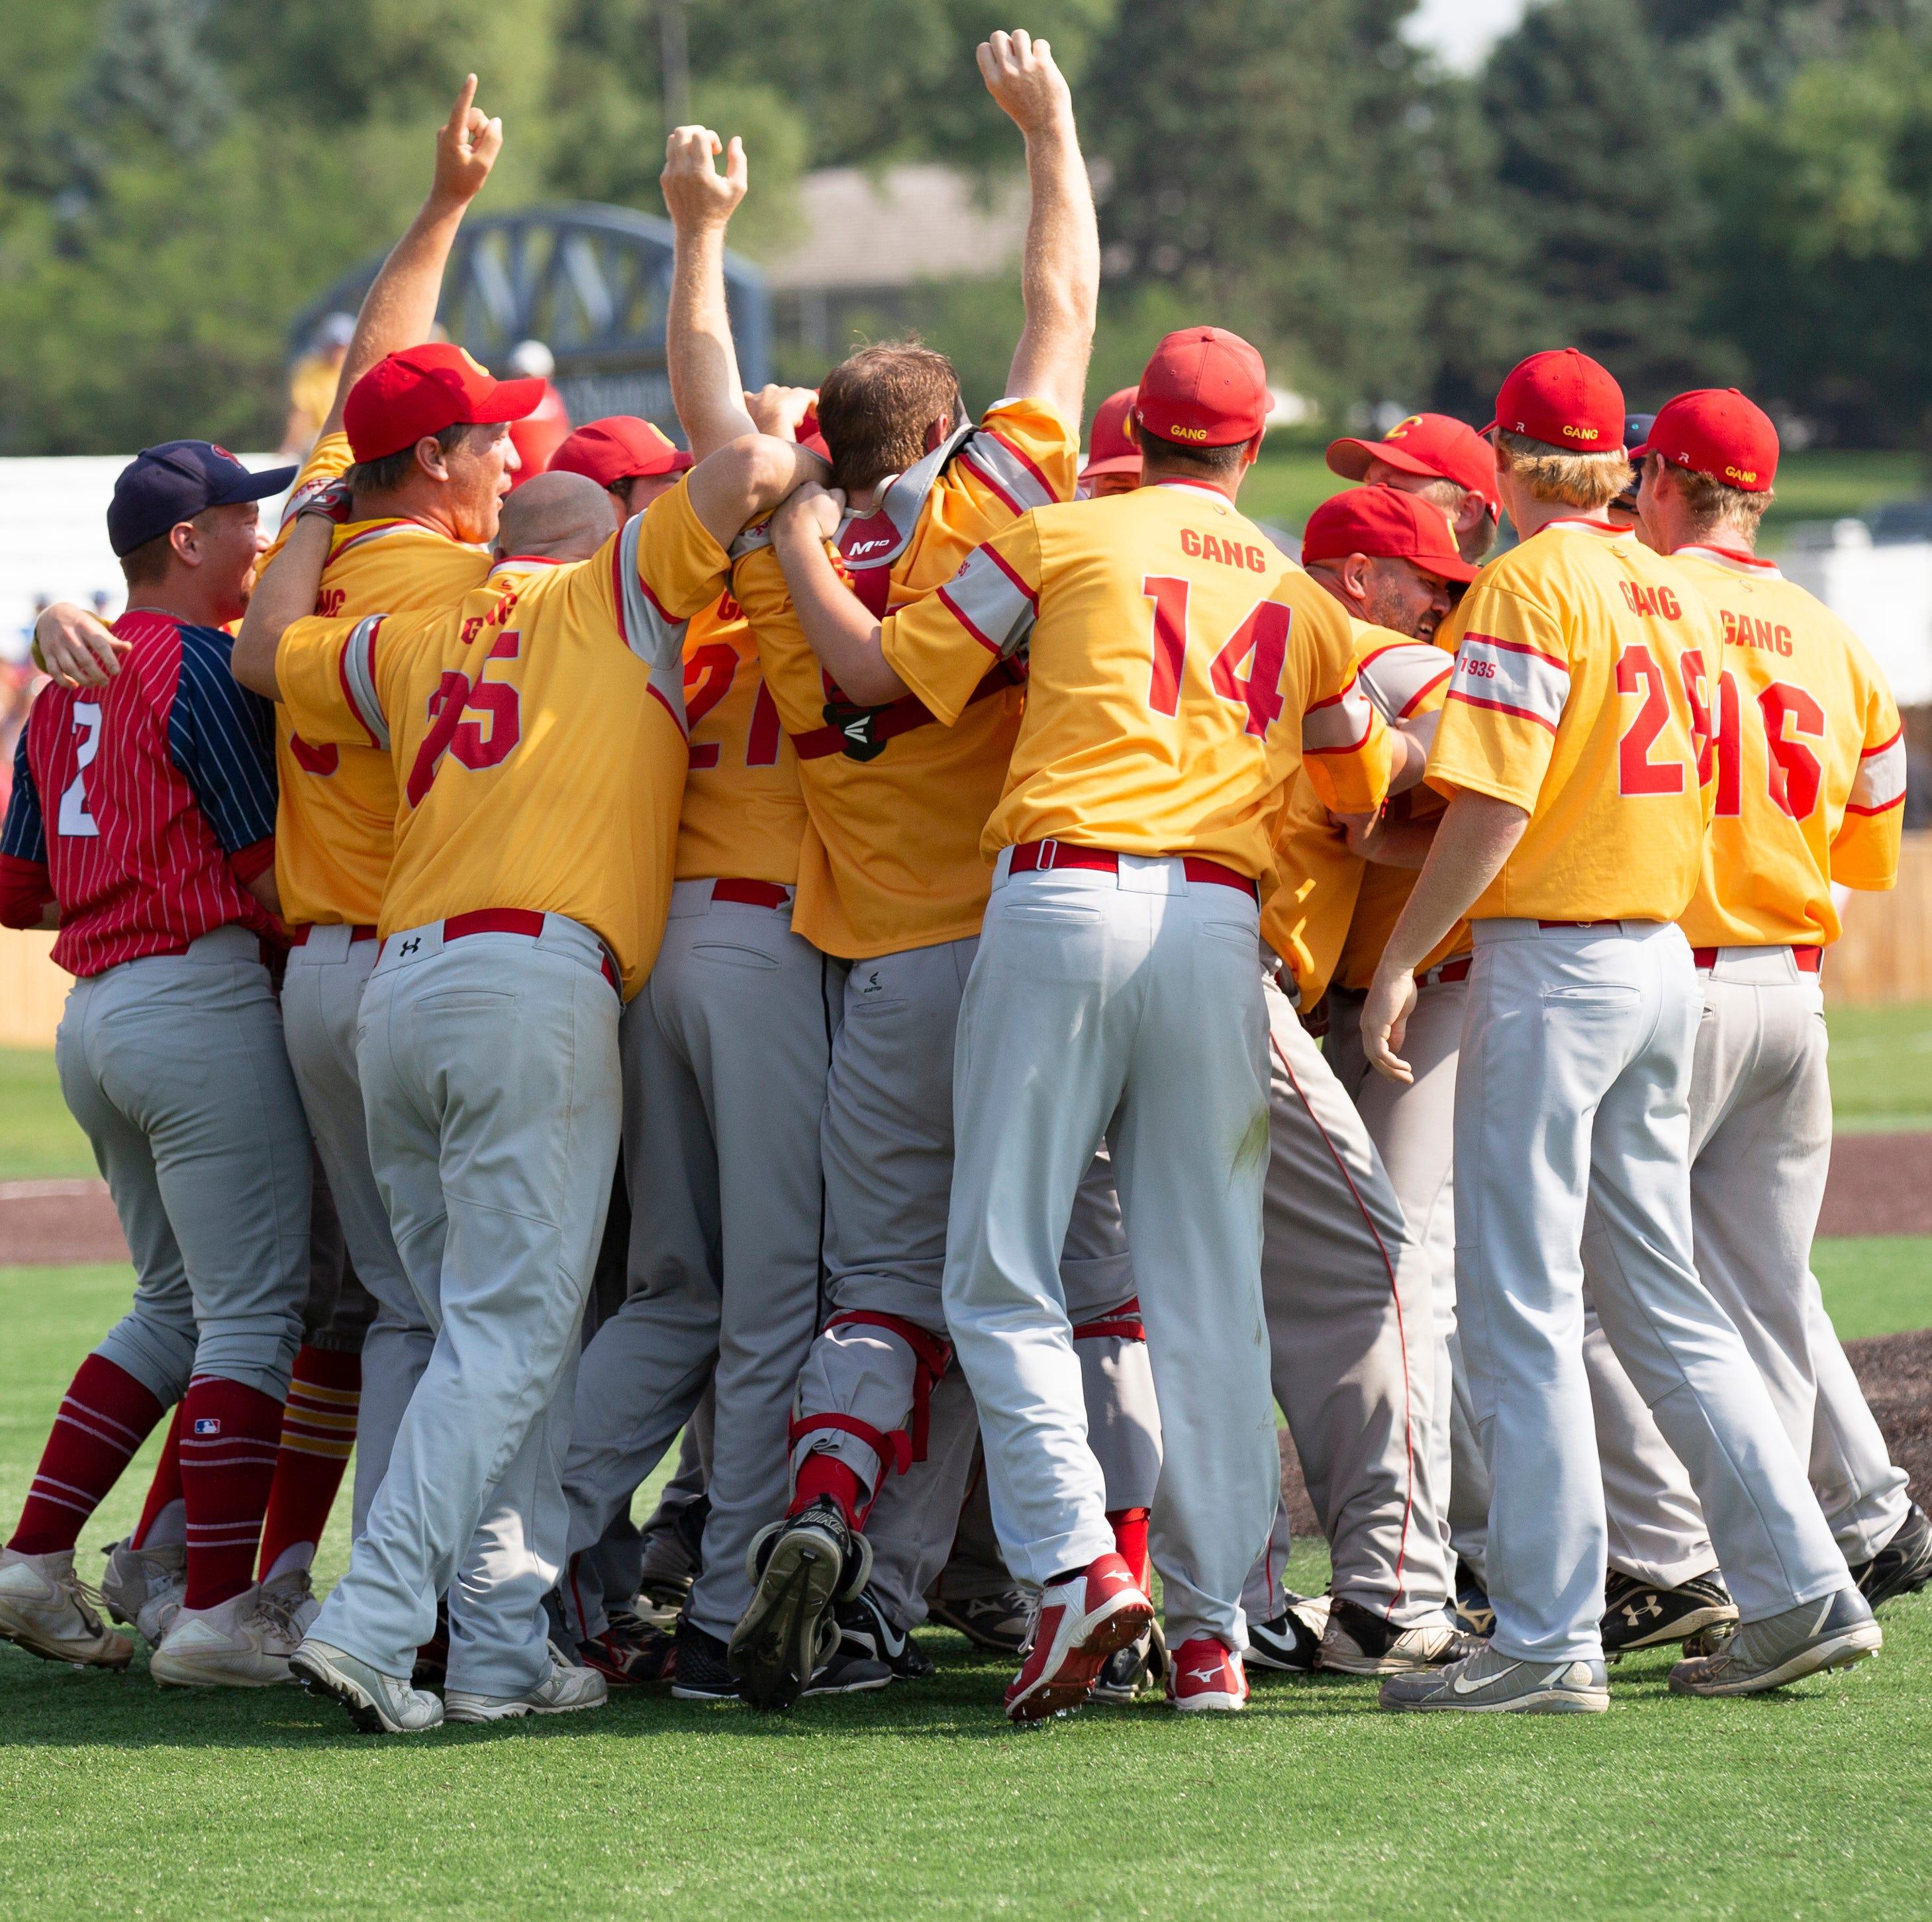 Canova Gang claim Class B state amateur baseball title